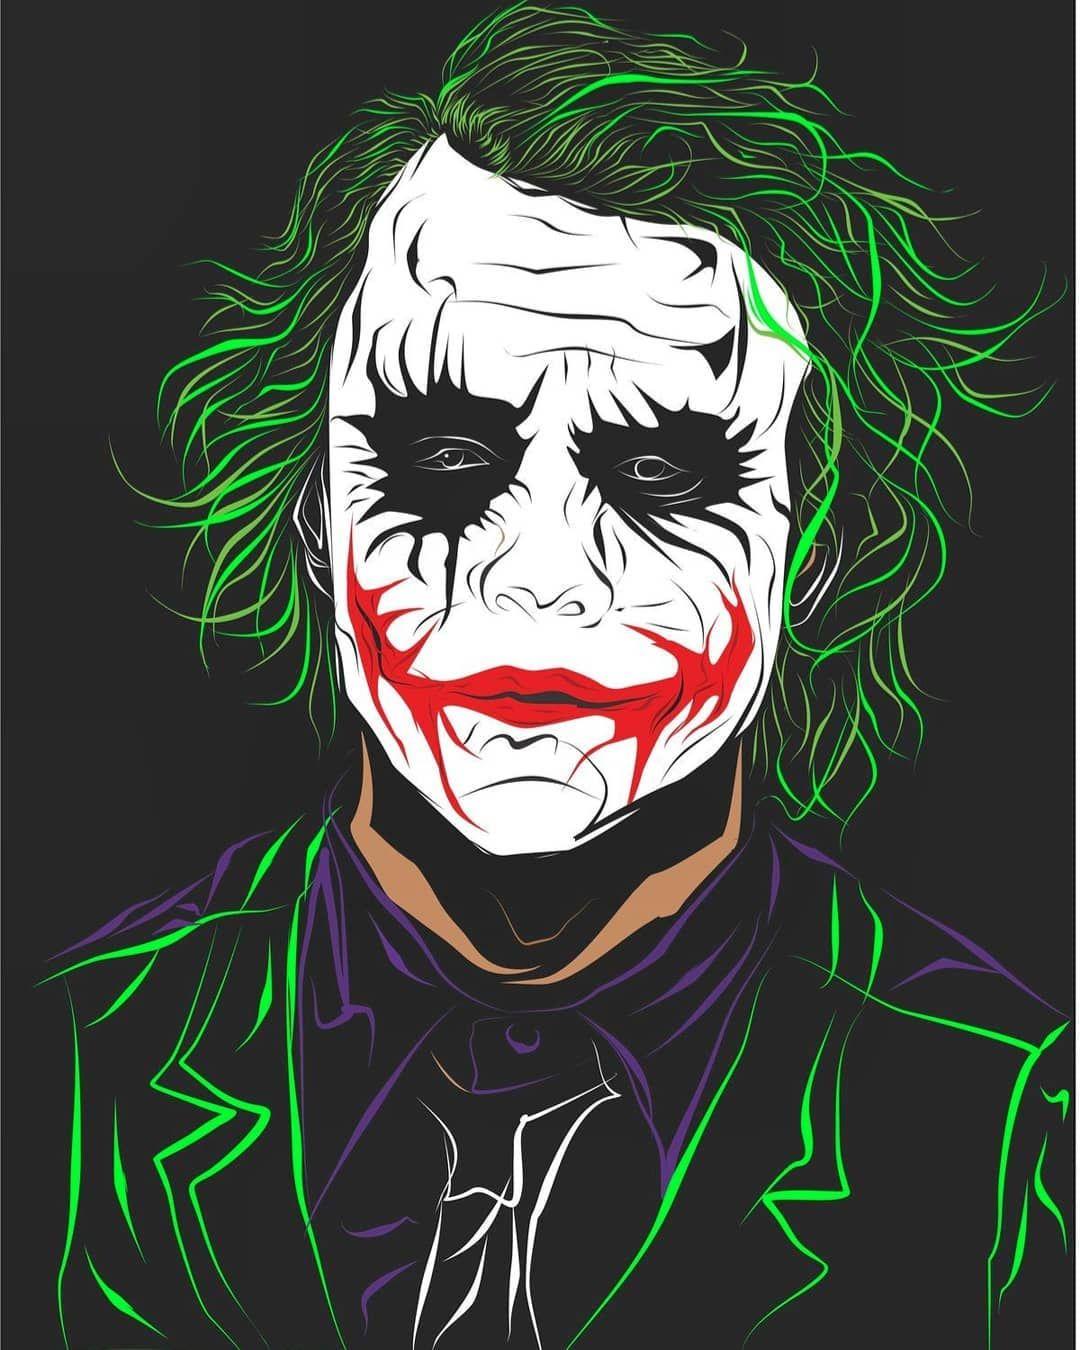 Pin By Daniel Escobar On El Joker With Images Joker Pics